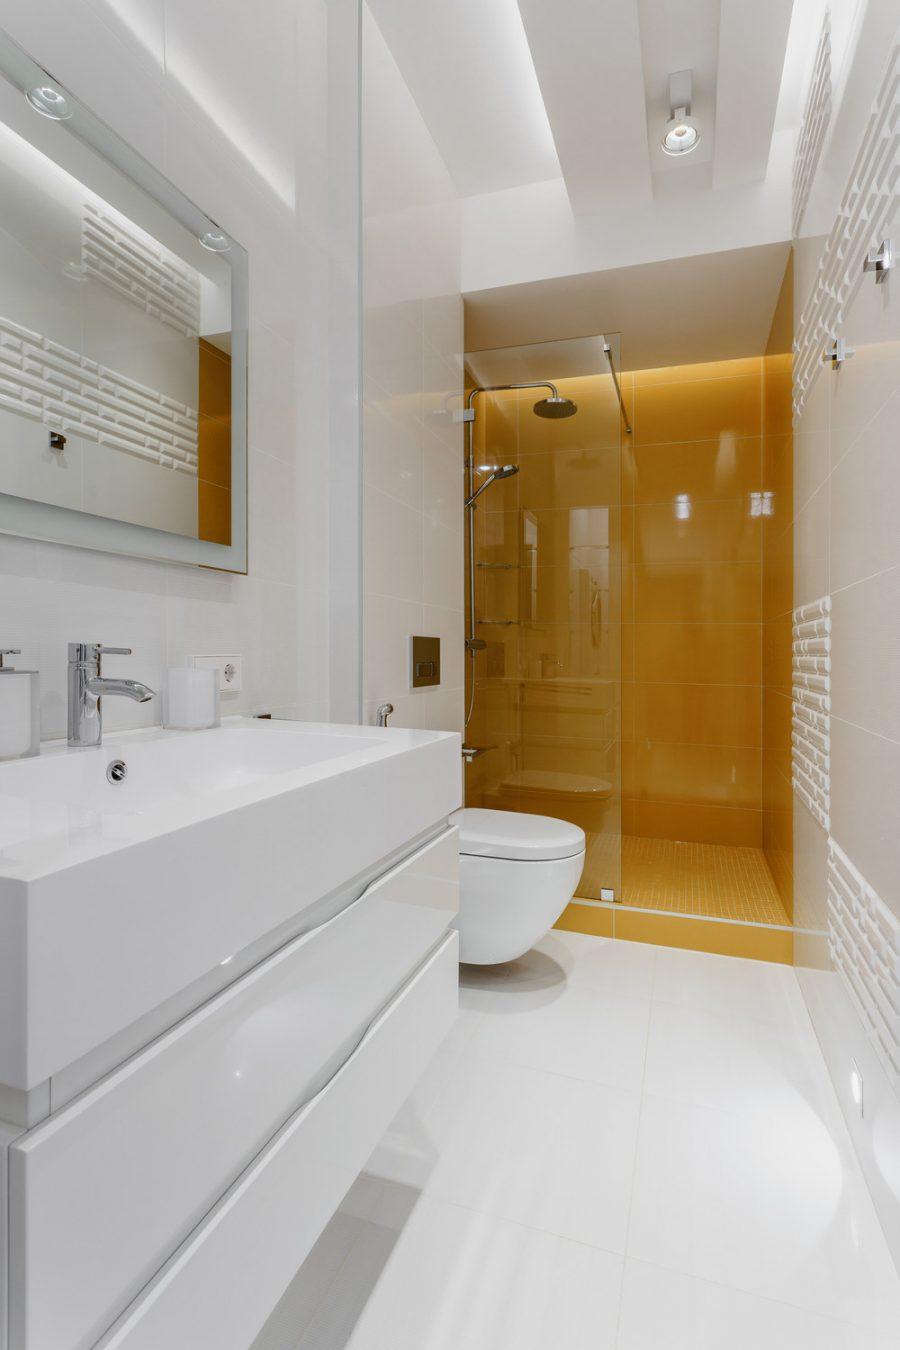 Модерен интериор на просторен апартамент в Санкт Петербург